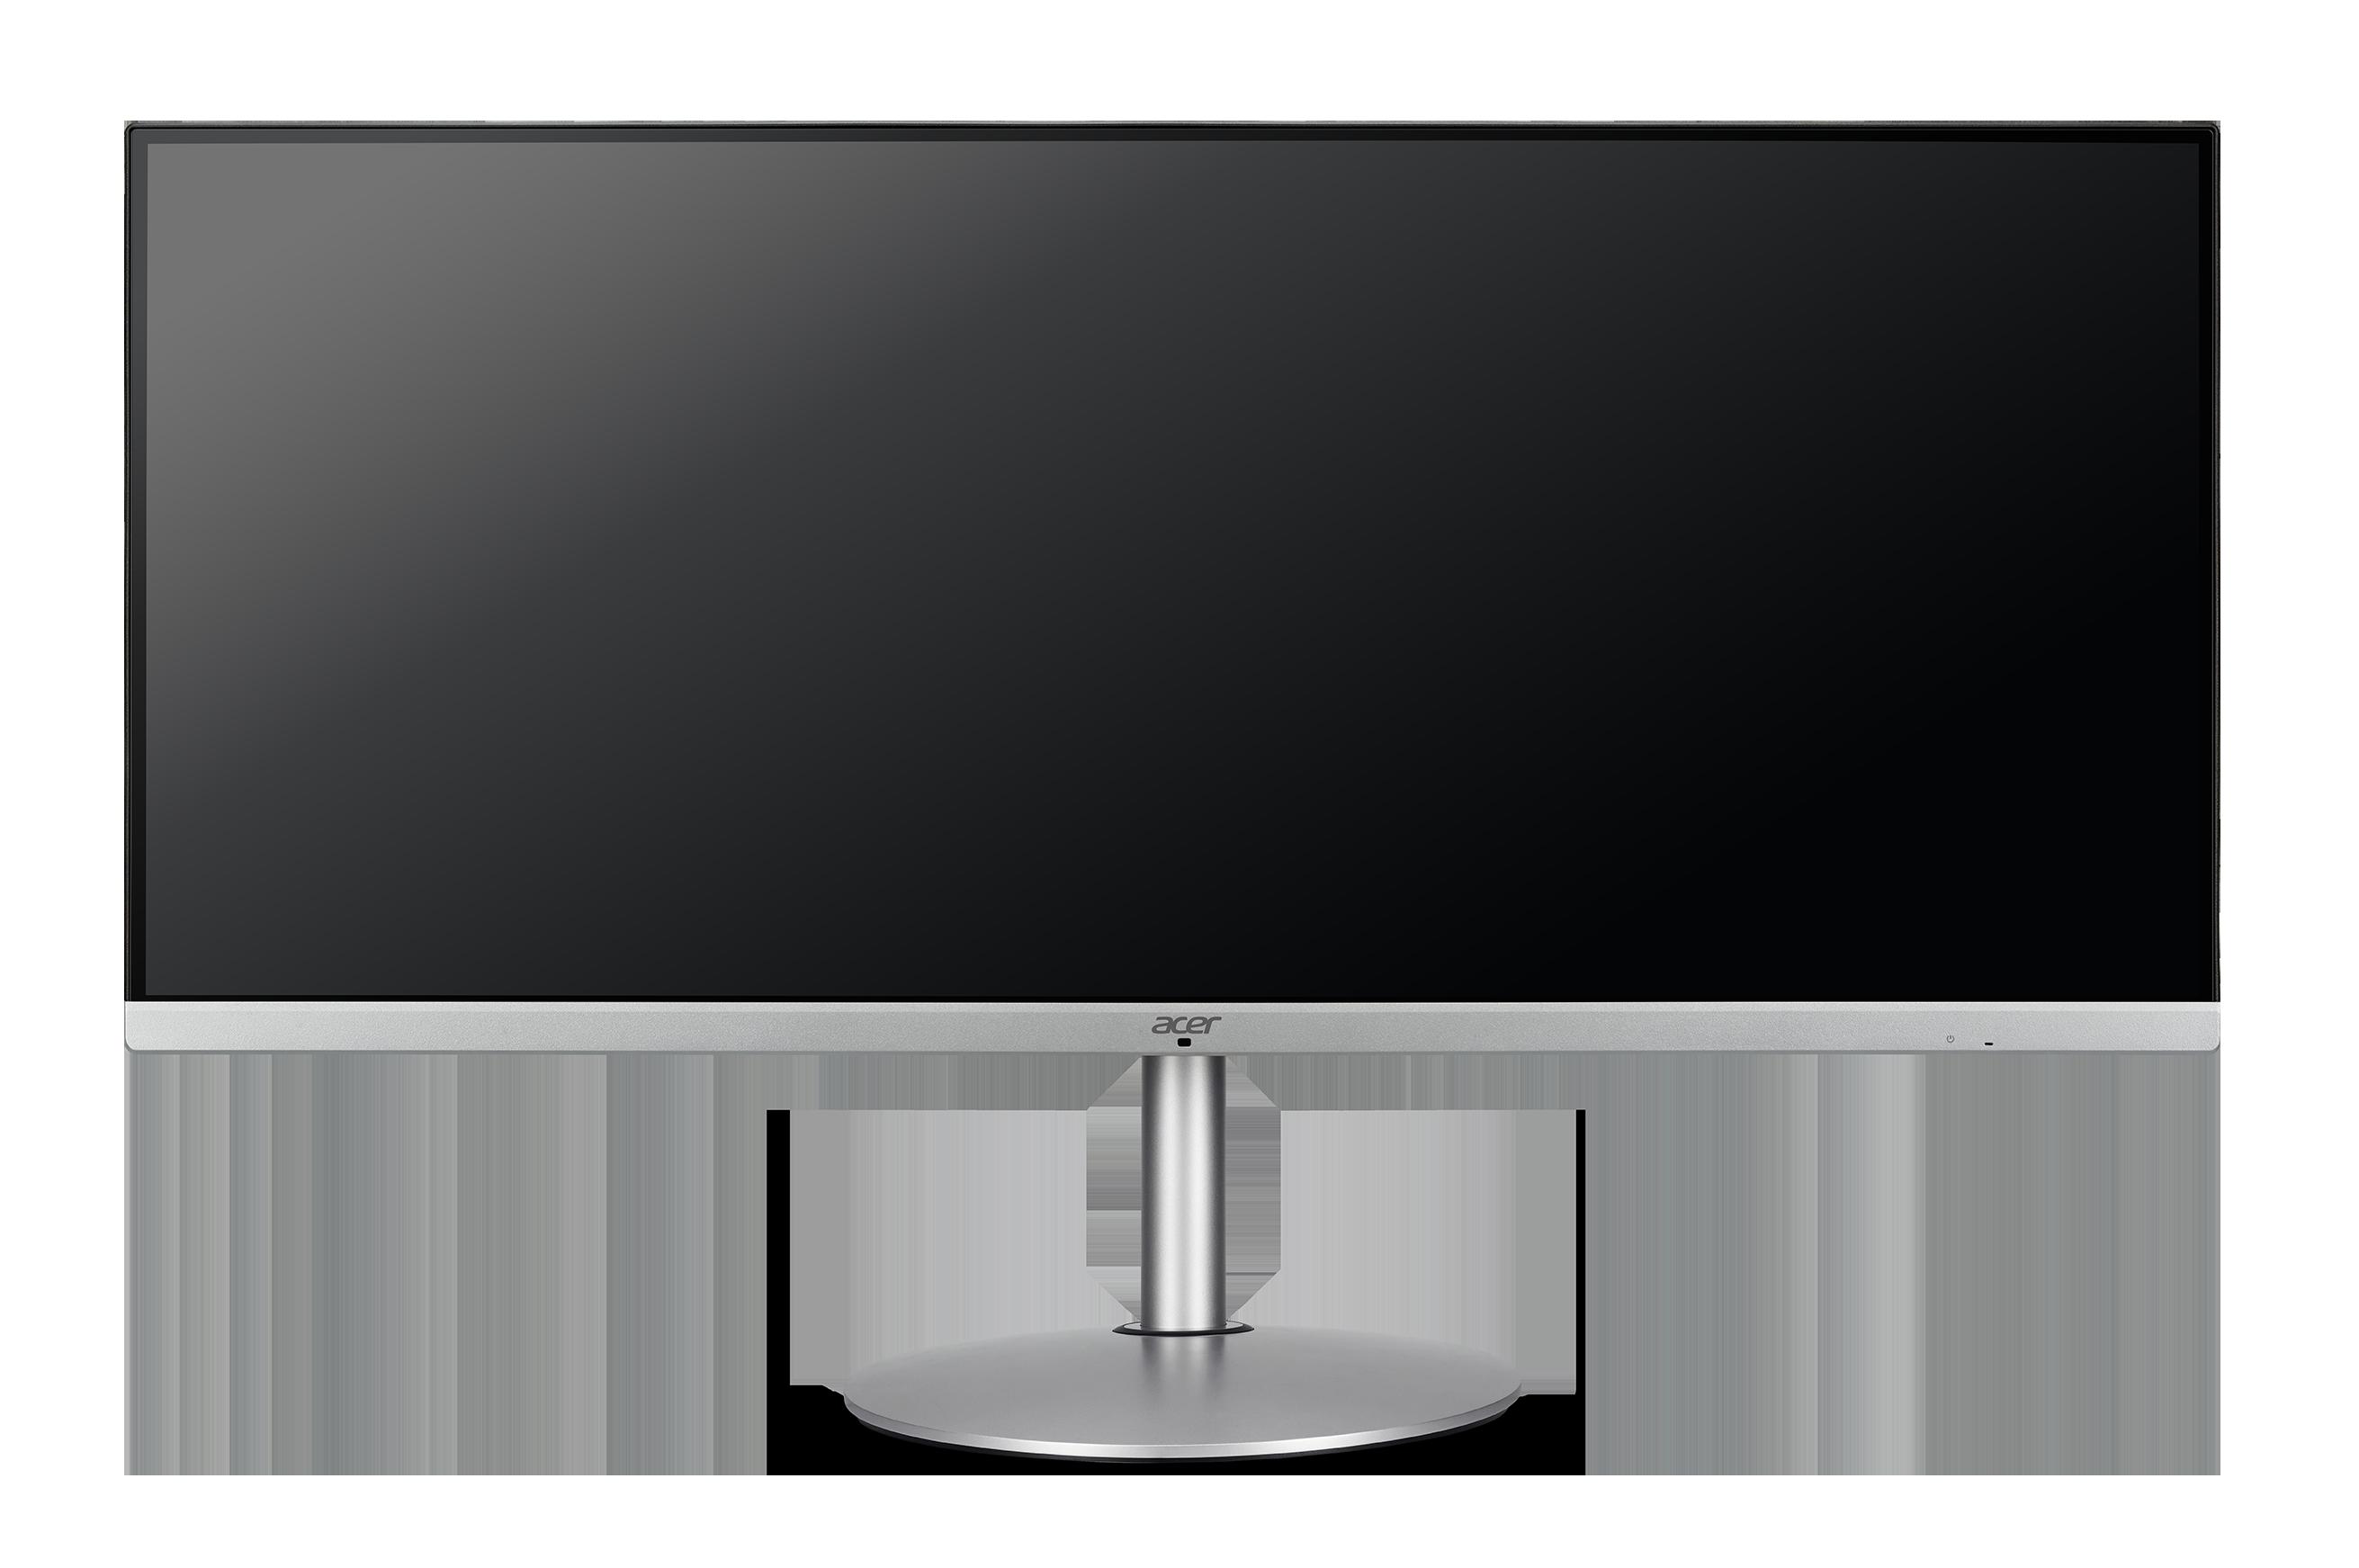 34'' Acer CB342CKC - IPS, QHD@75Hz, 1ms, 250cd/m2, 21:9, HDMI, DP, USB-C, USB, FreeSync, HDR, výška - UM.CB2EE.C01